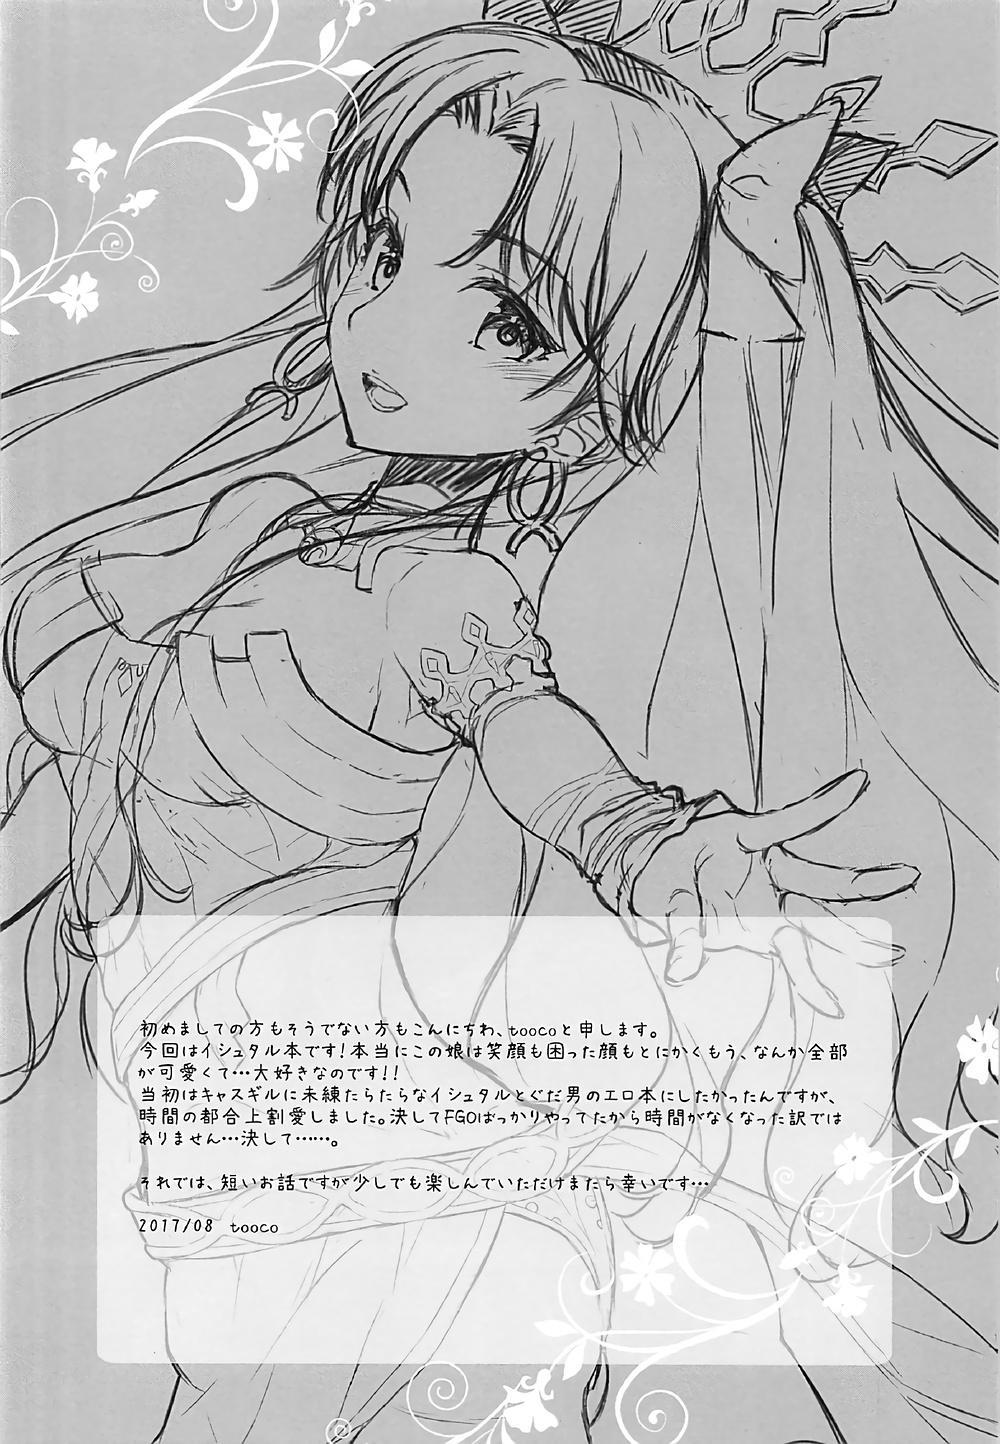 Boku no Megami-sama & C.C. Collection 2017 Summer 2